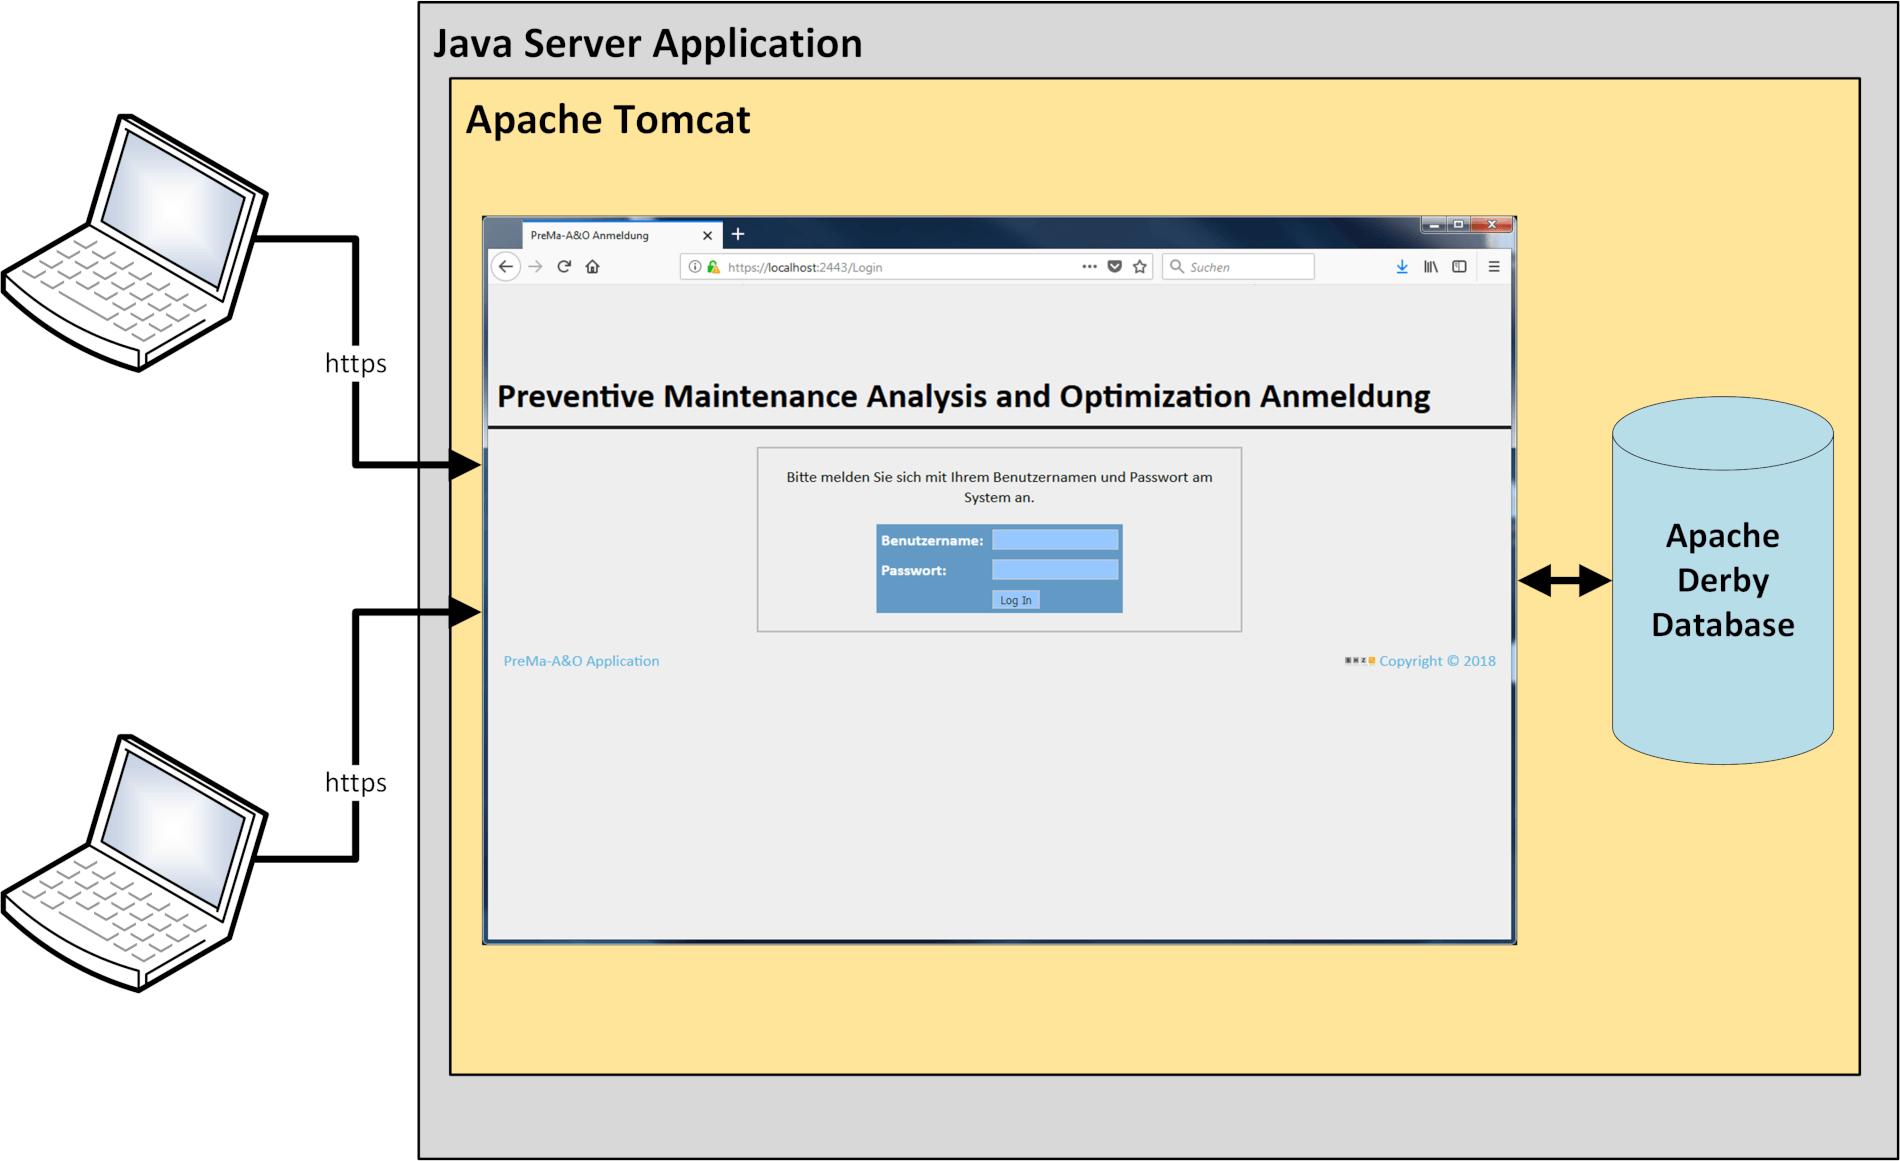 Server Architektur PreMa-A&O